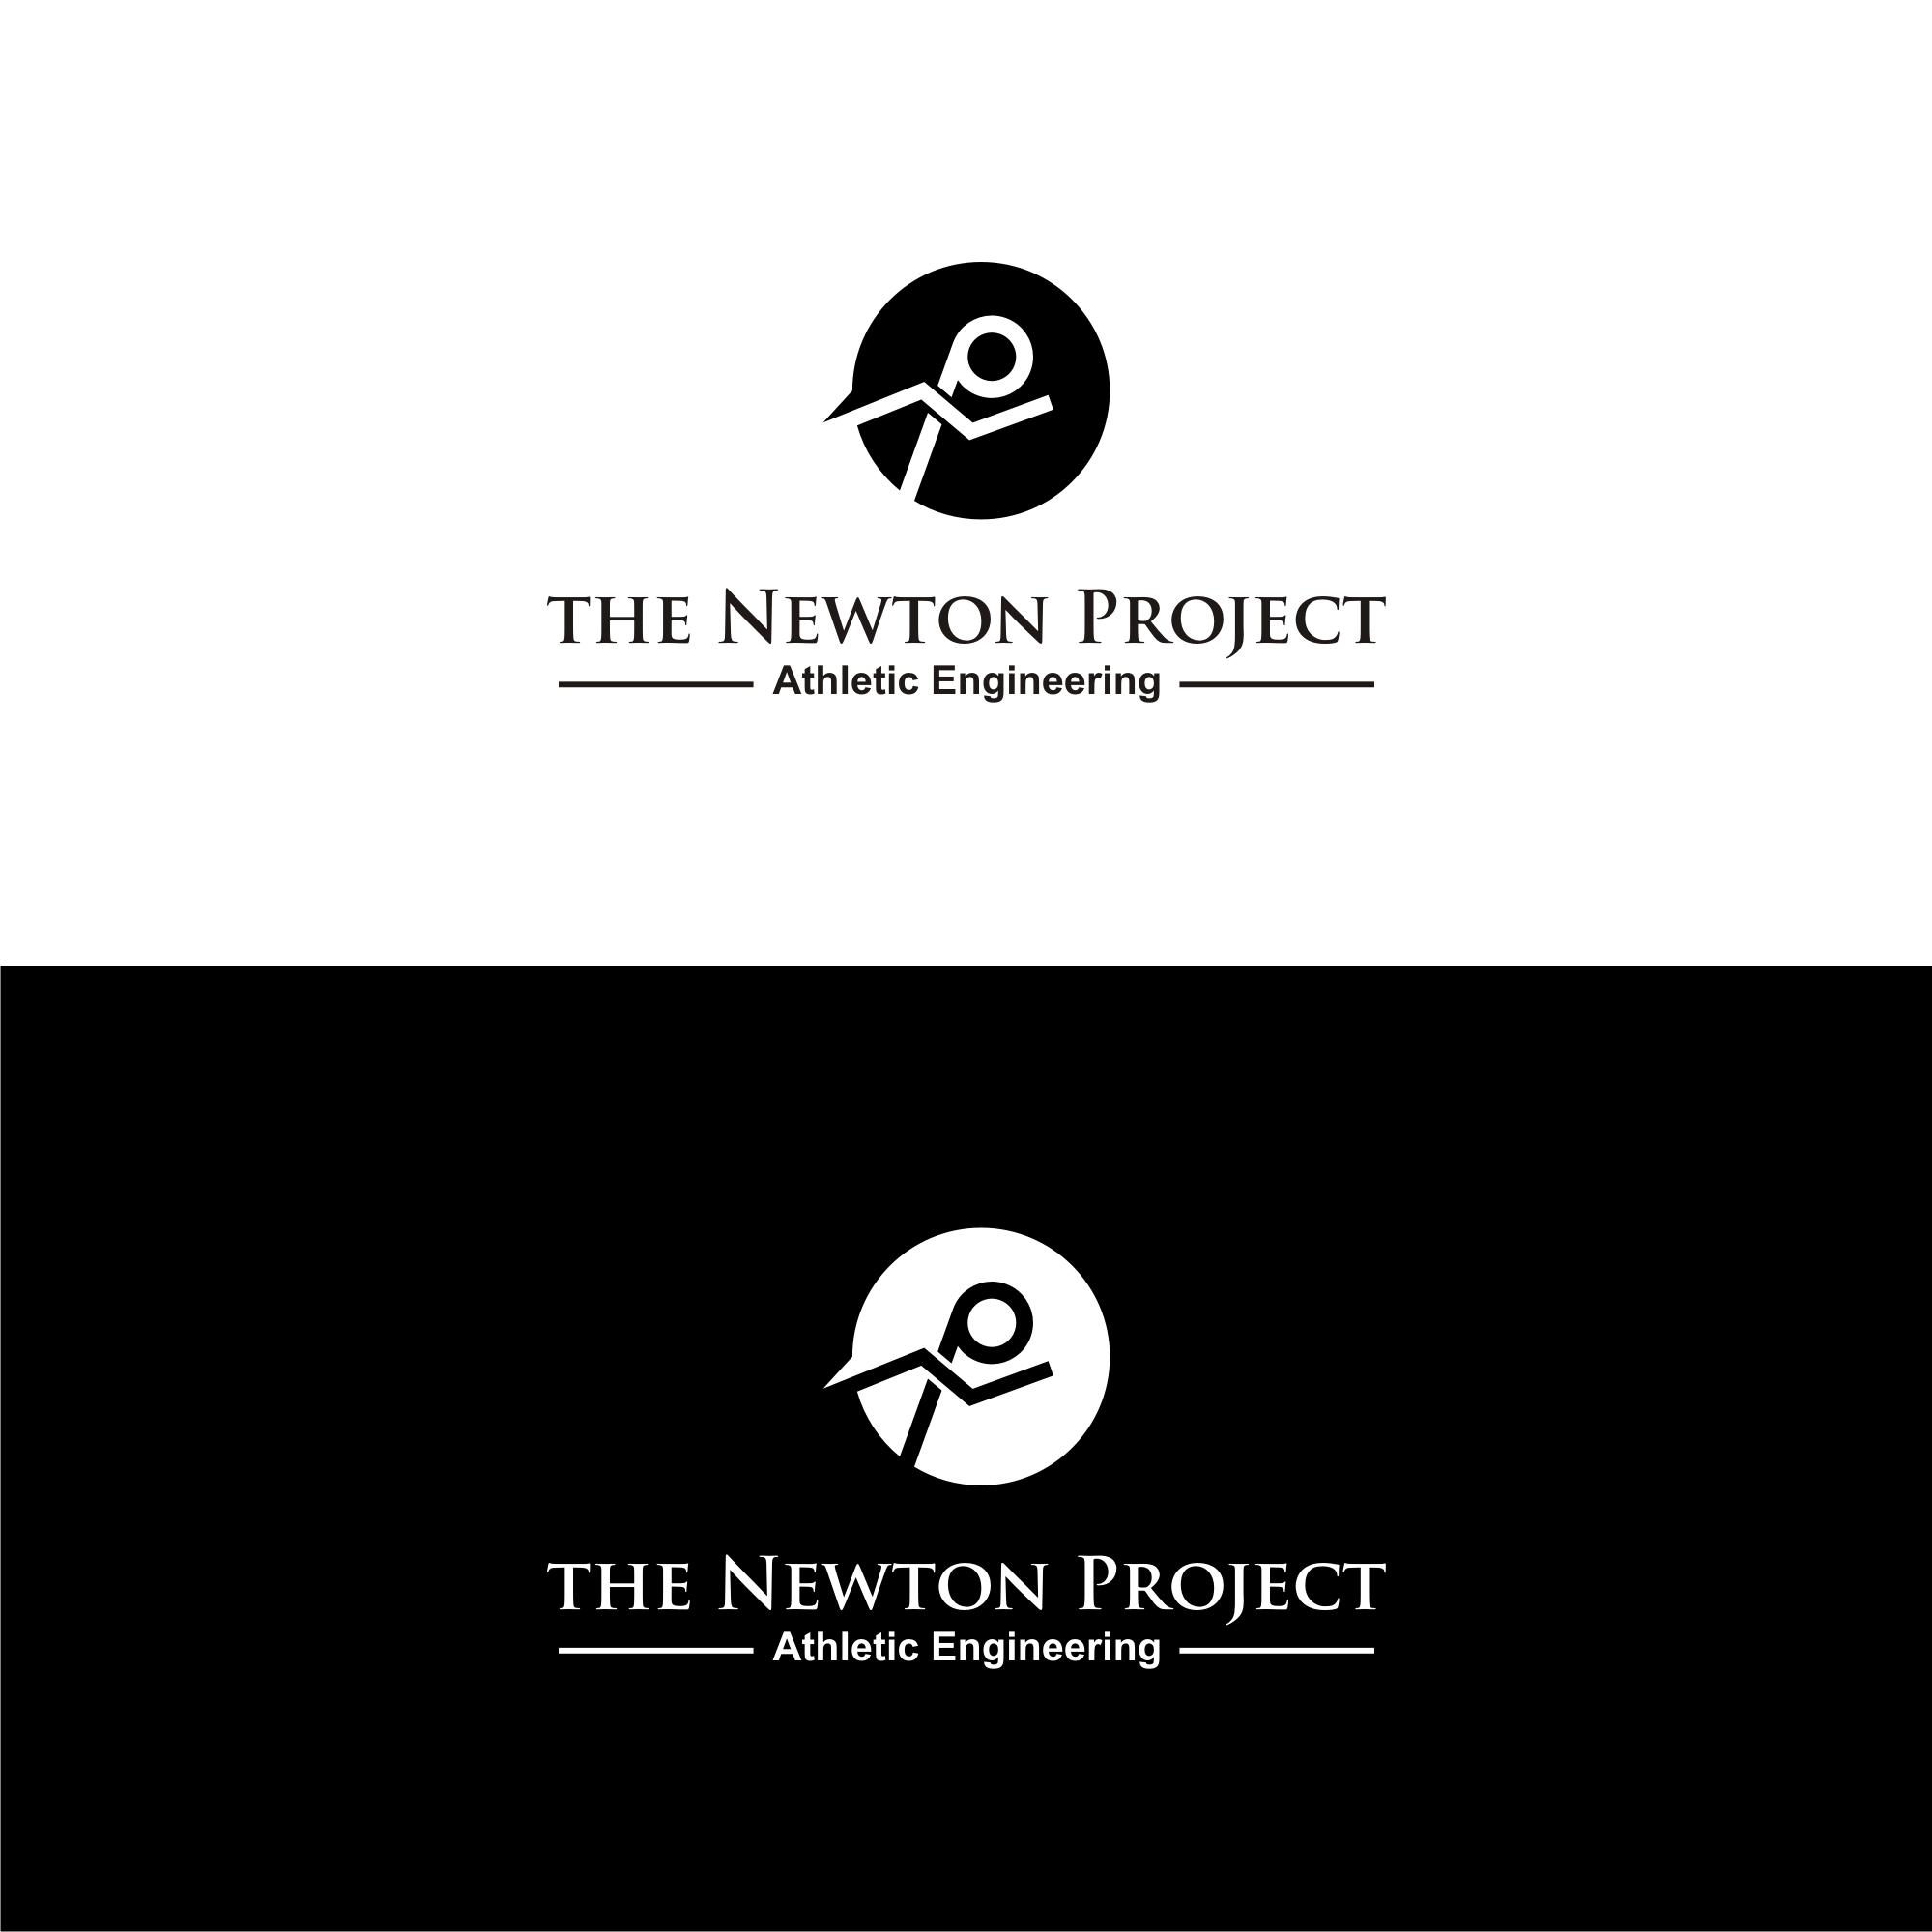 design #50 of Naya